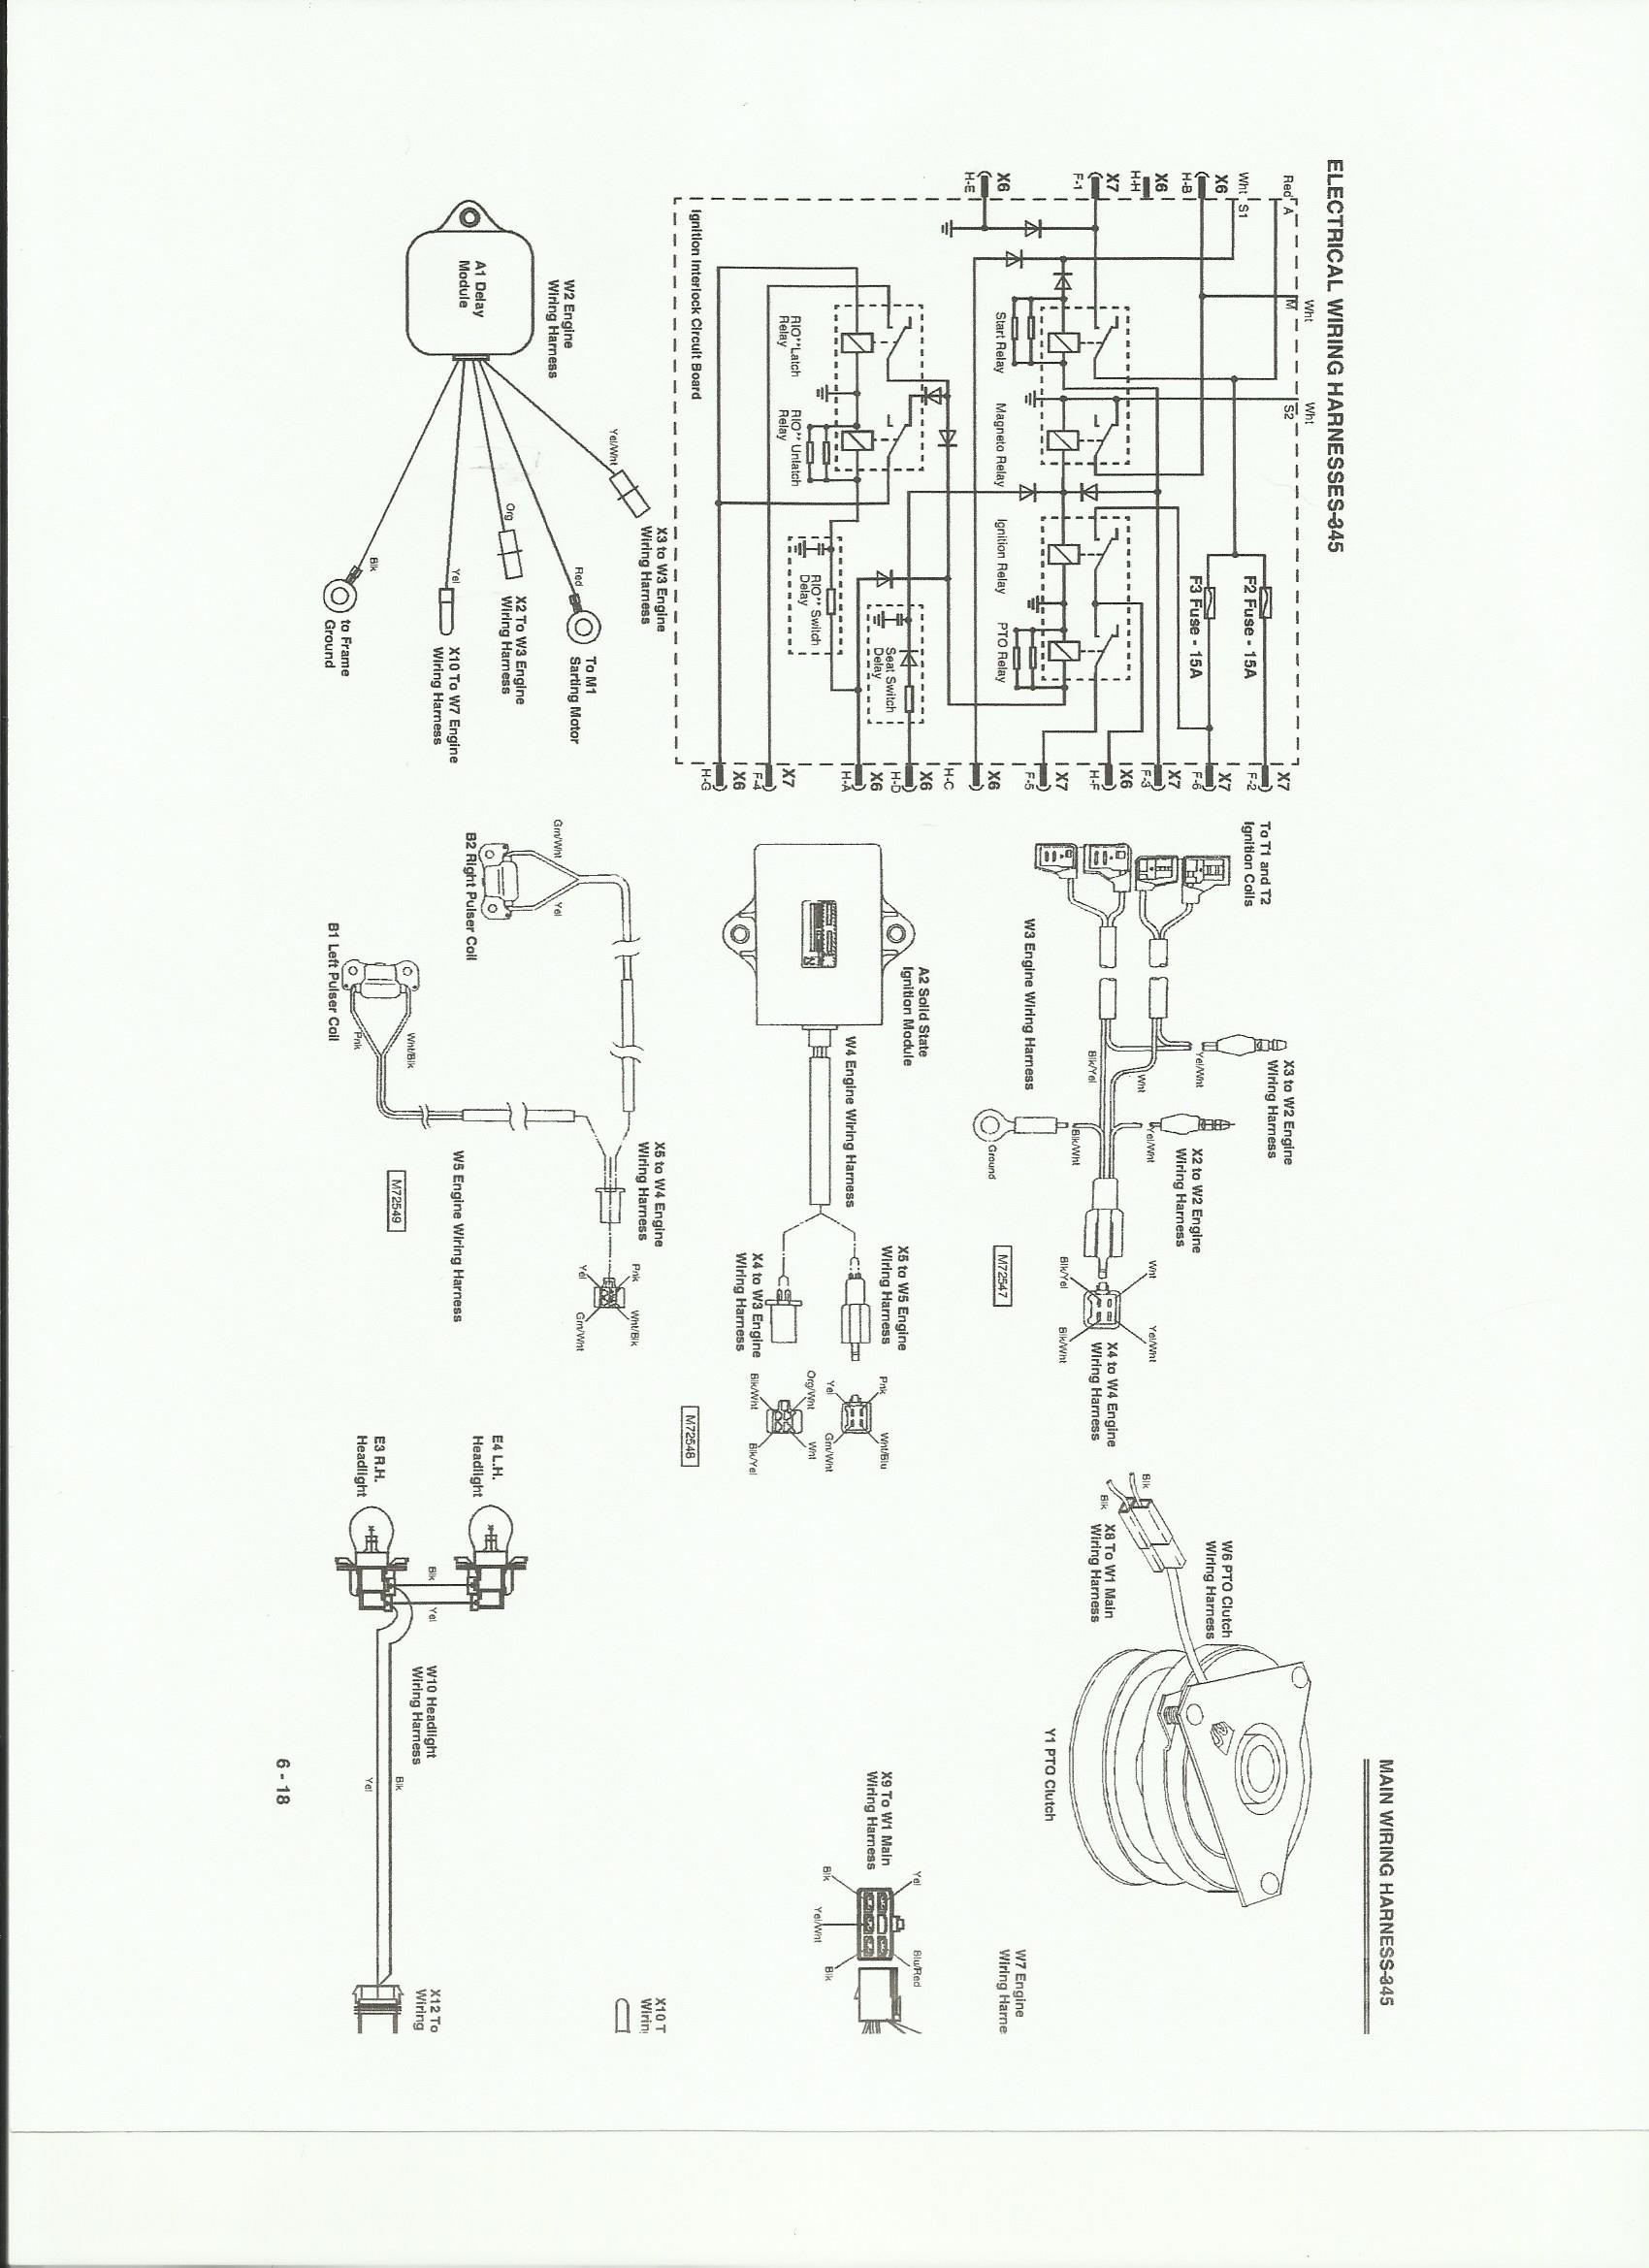 John Deere 345 Wiring Diagram